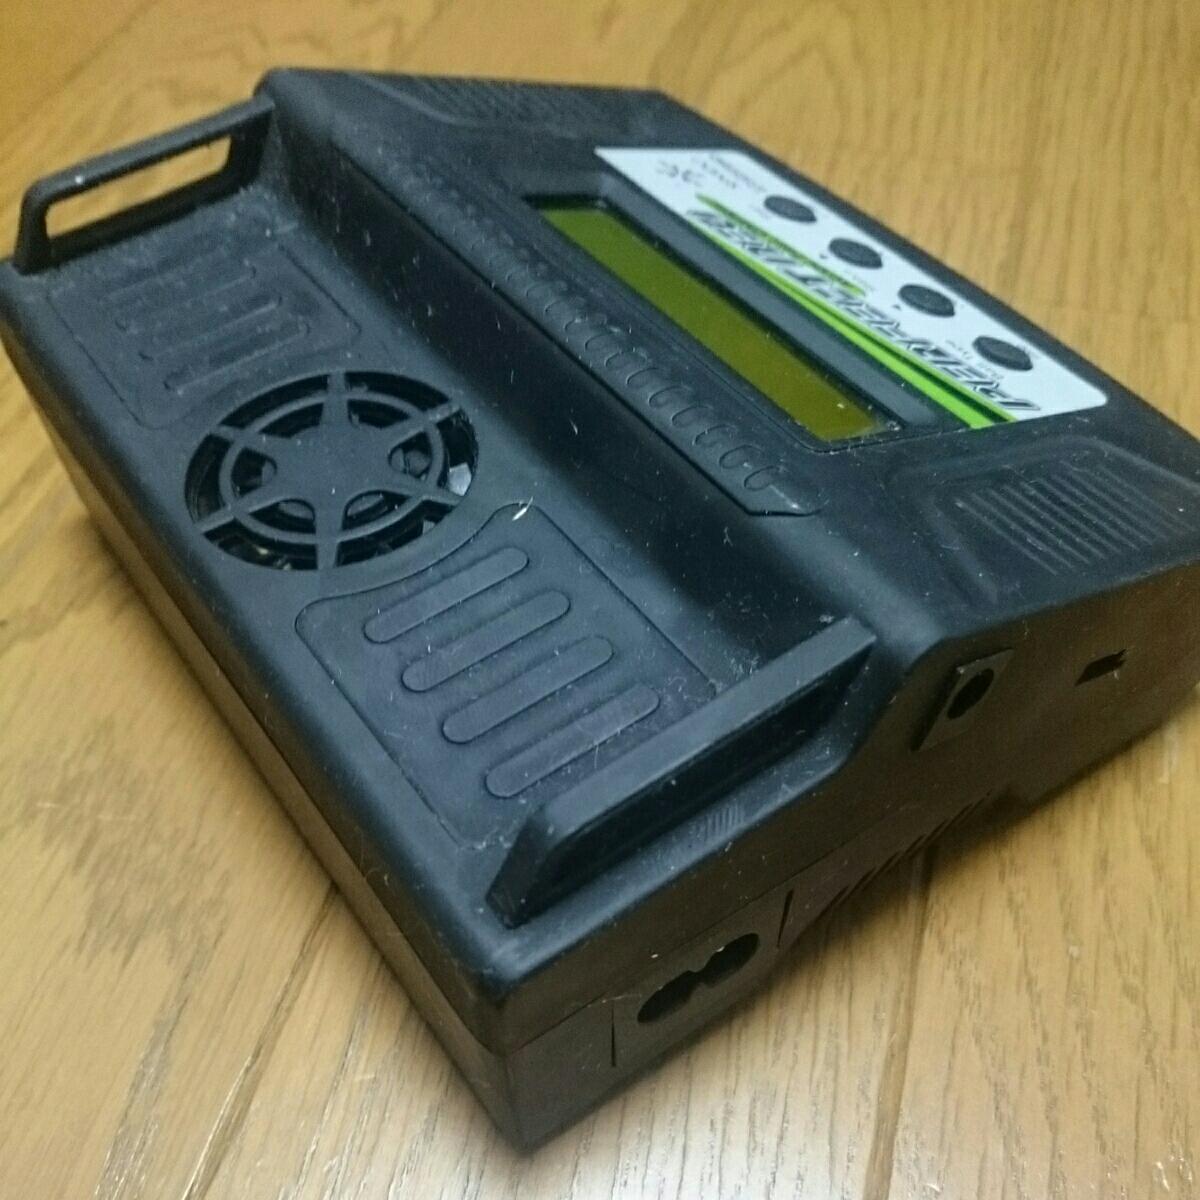 Powers パーフェクト ネオ 急速充電器 動作OK ジャンク / リポ、リフェ、ニカド、ニッケル水素_画像5